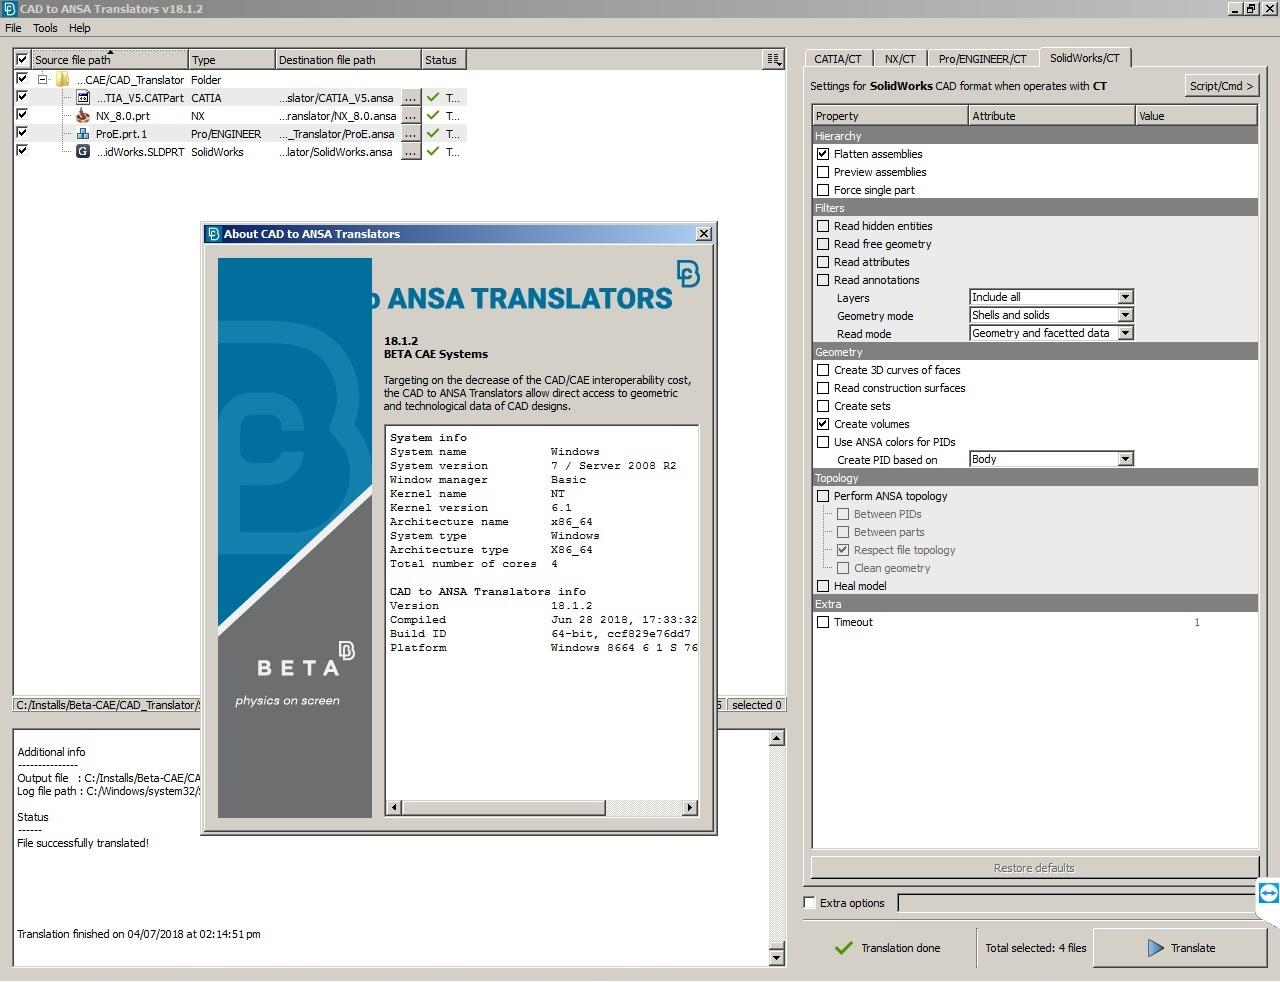 Working with BETA-CAE Systems Nasa Translators v18.1.2 full license